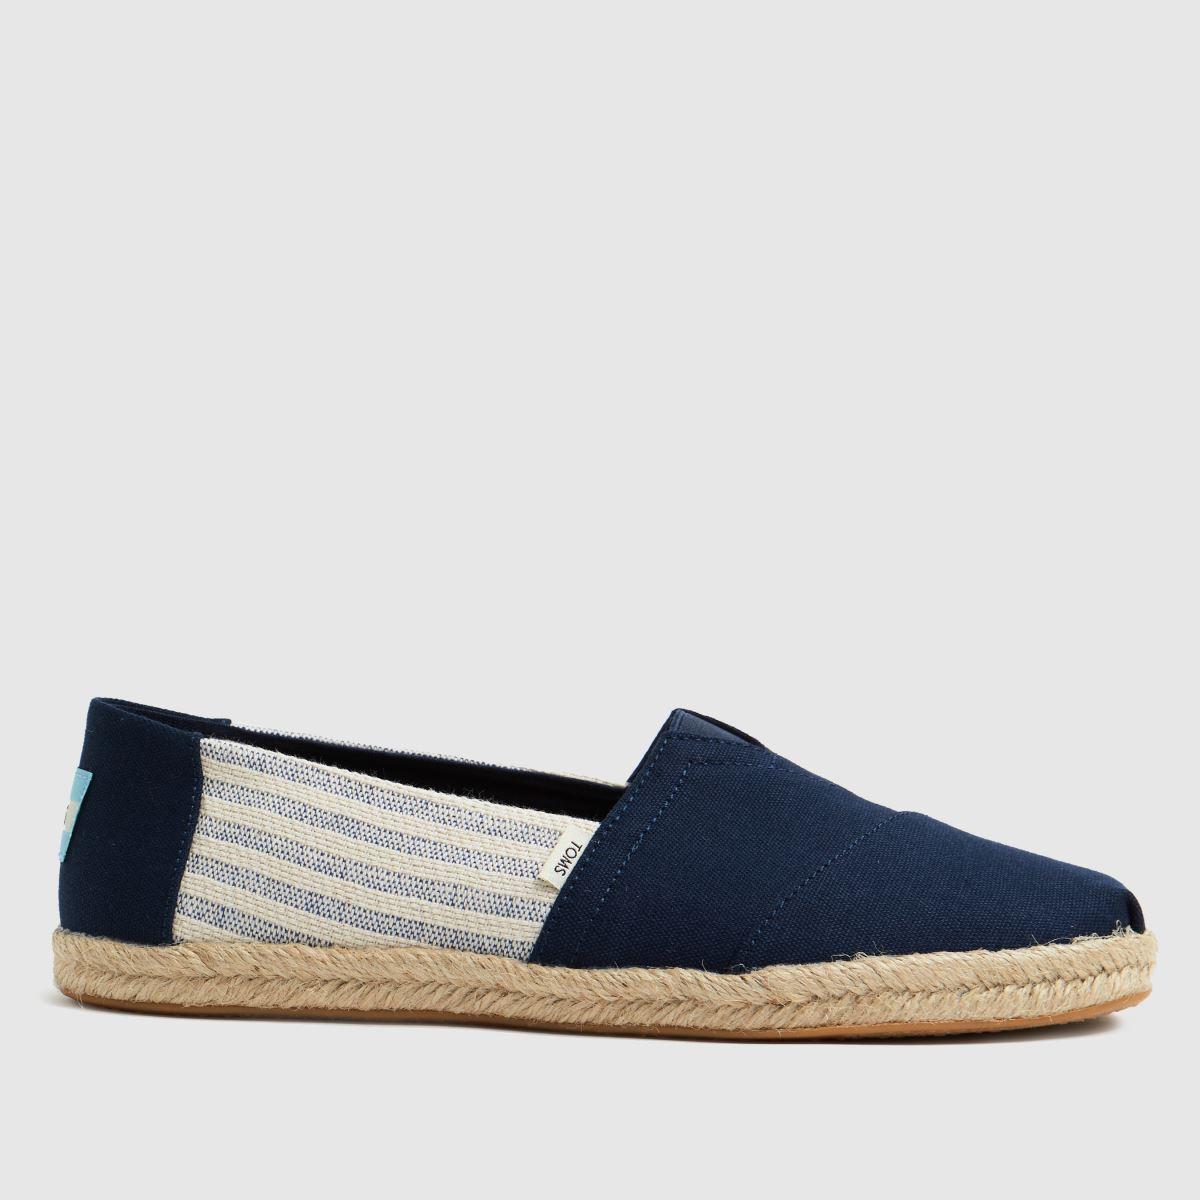 TOMS Navy Alpargata Rope Vegan Shoes